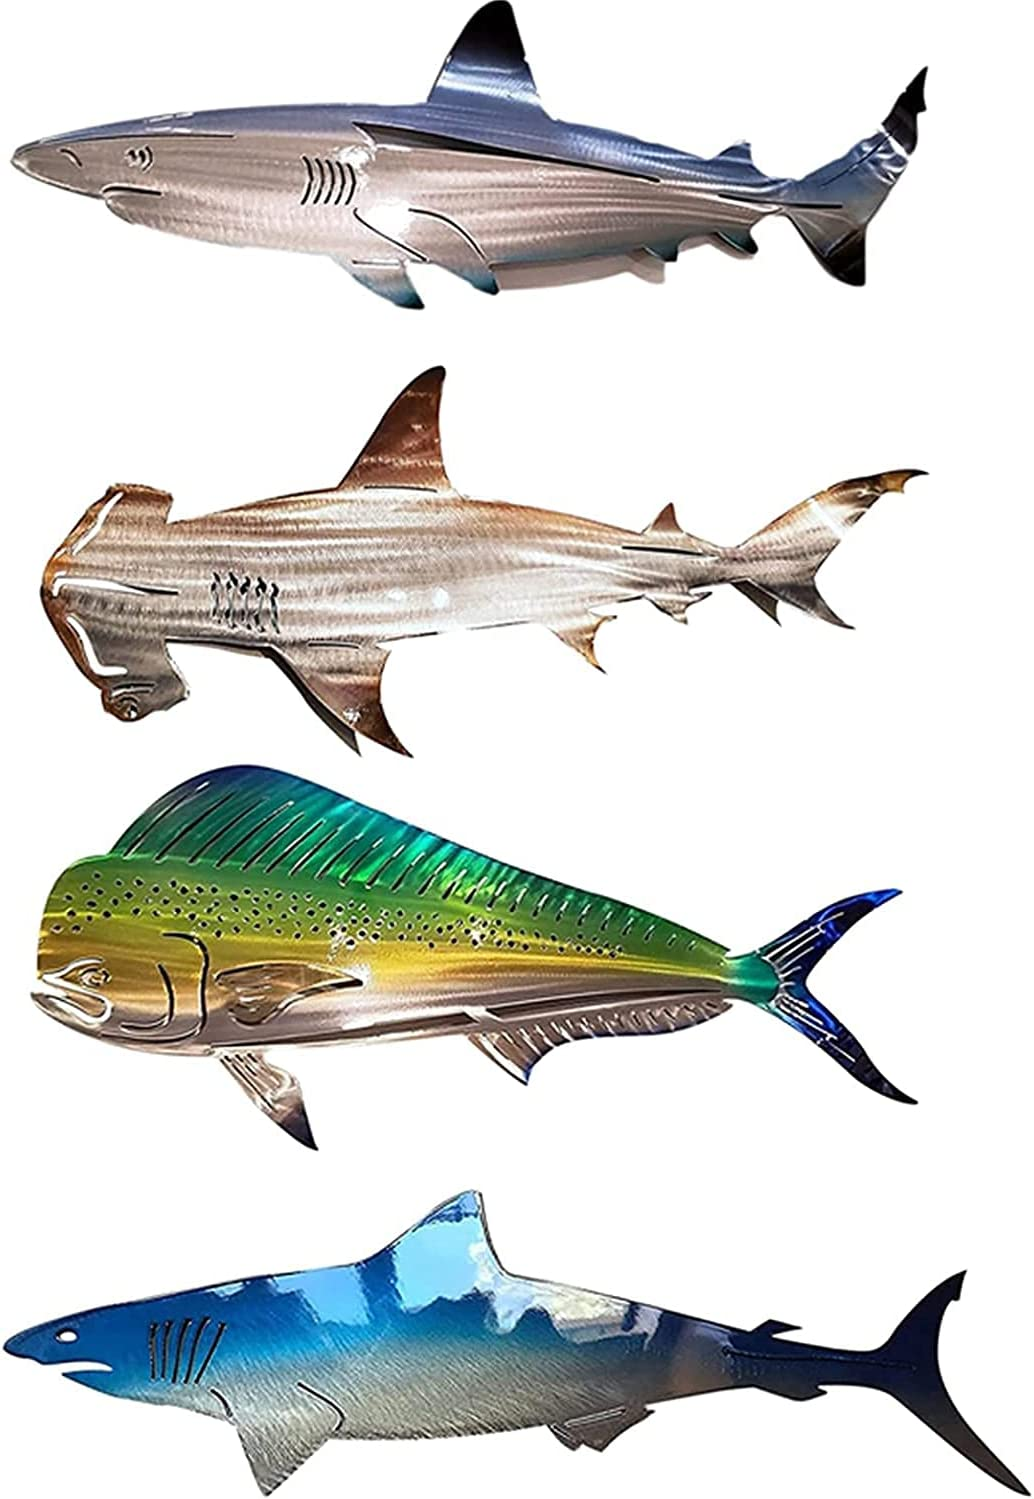 Metal Shark Art Wall Decor,Shark Metal Sculpture Outdoor Inspirational Wall Art Hanging Ornament for Home Nautical Decor Ocean Fish Decoration Patio or Pool(4Pcs,20in)